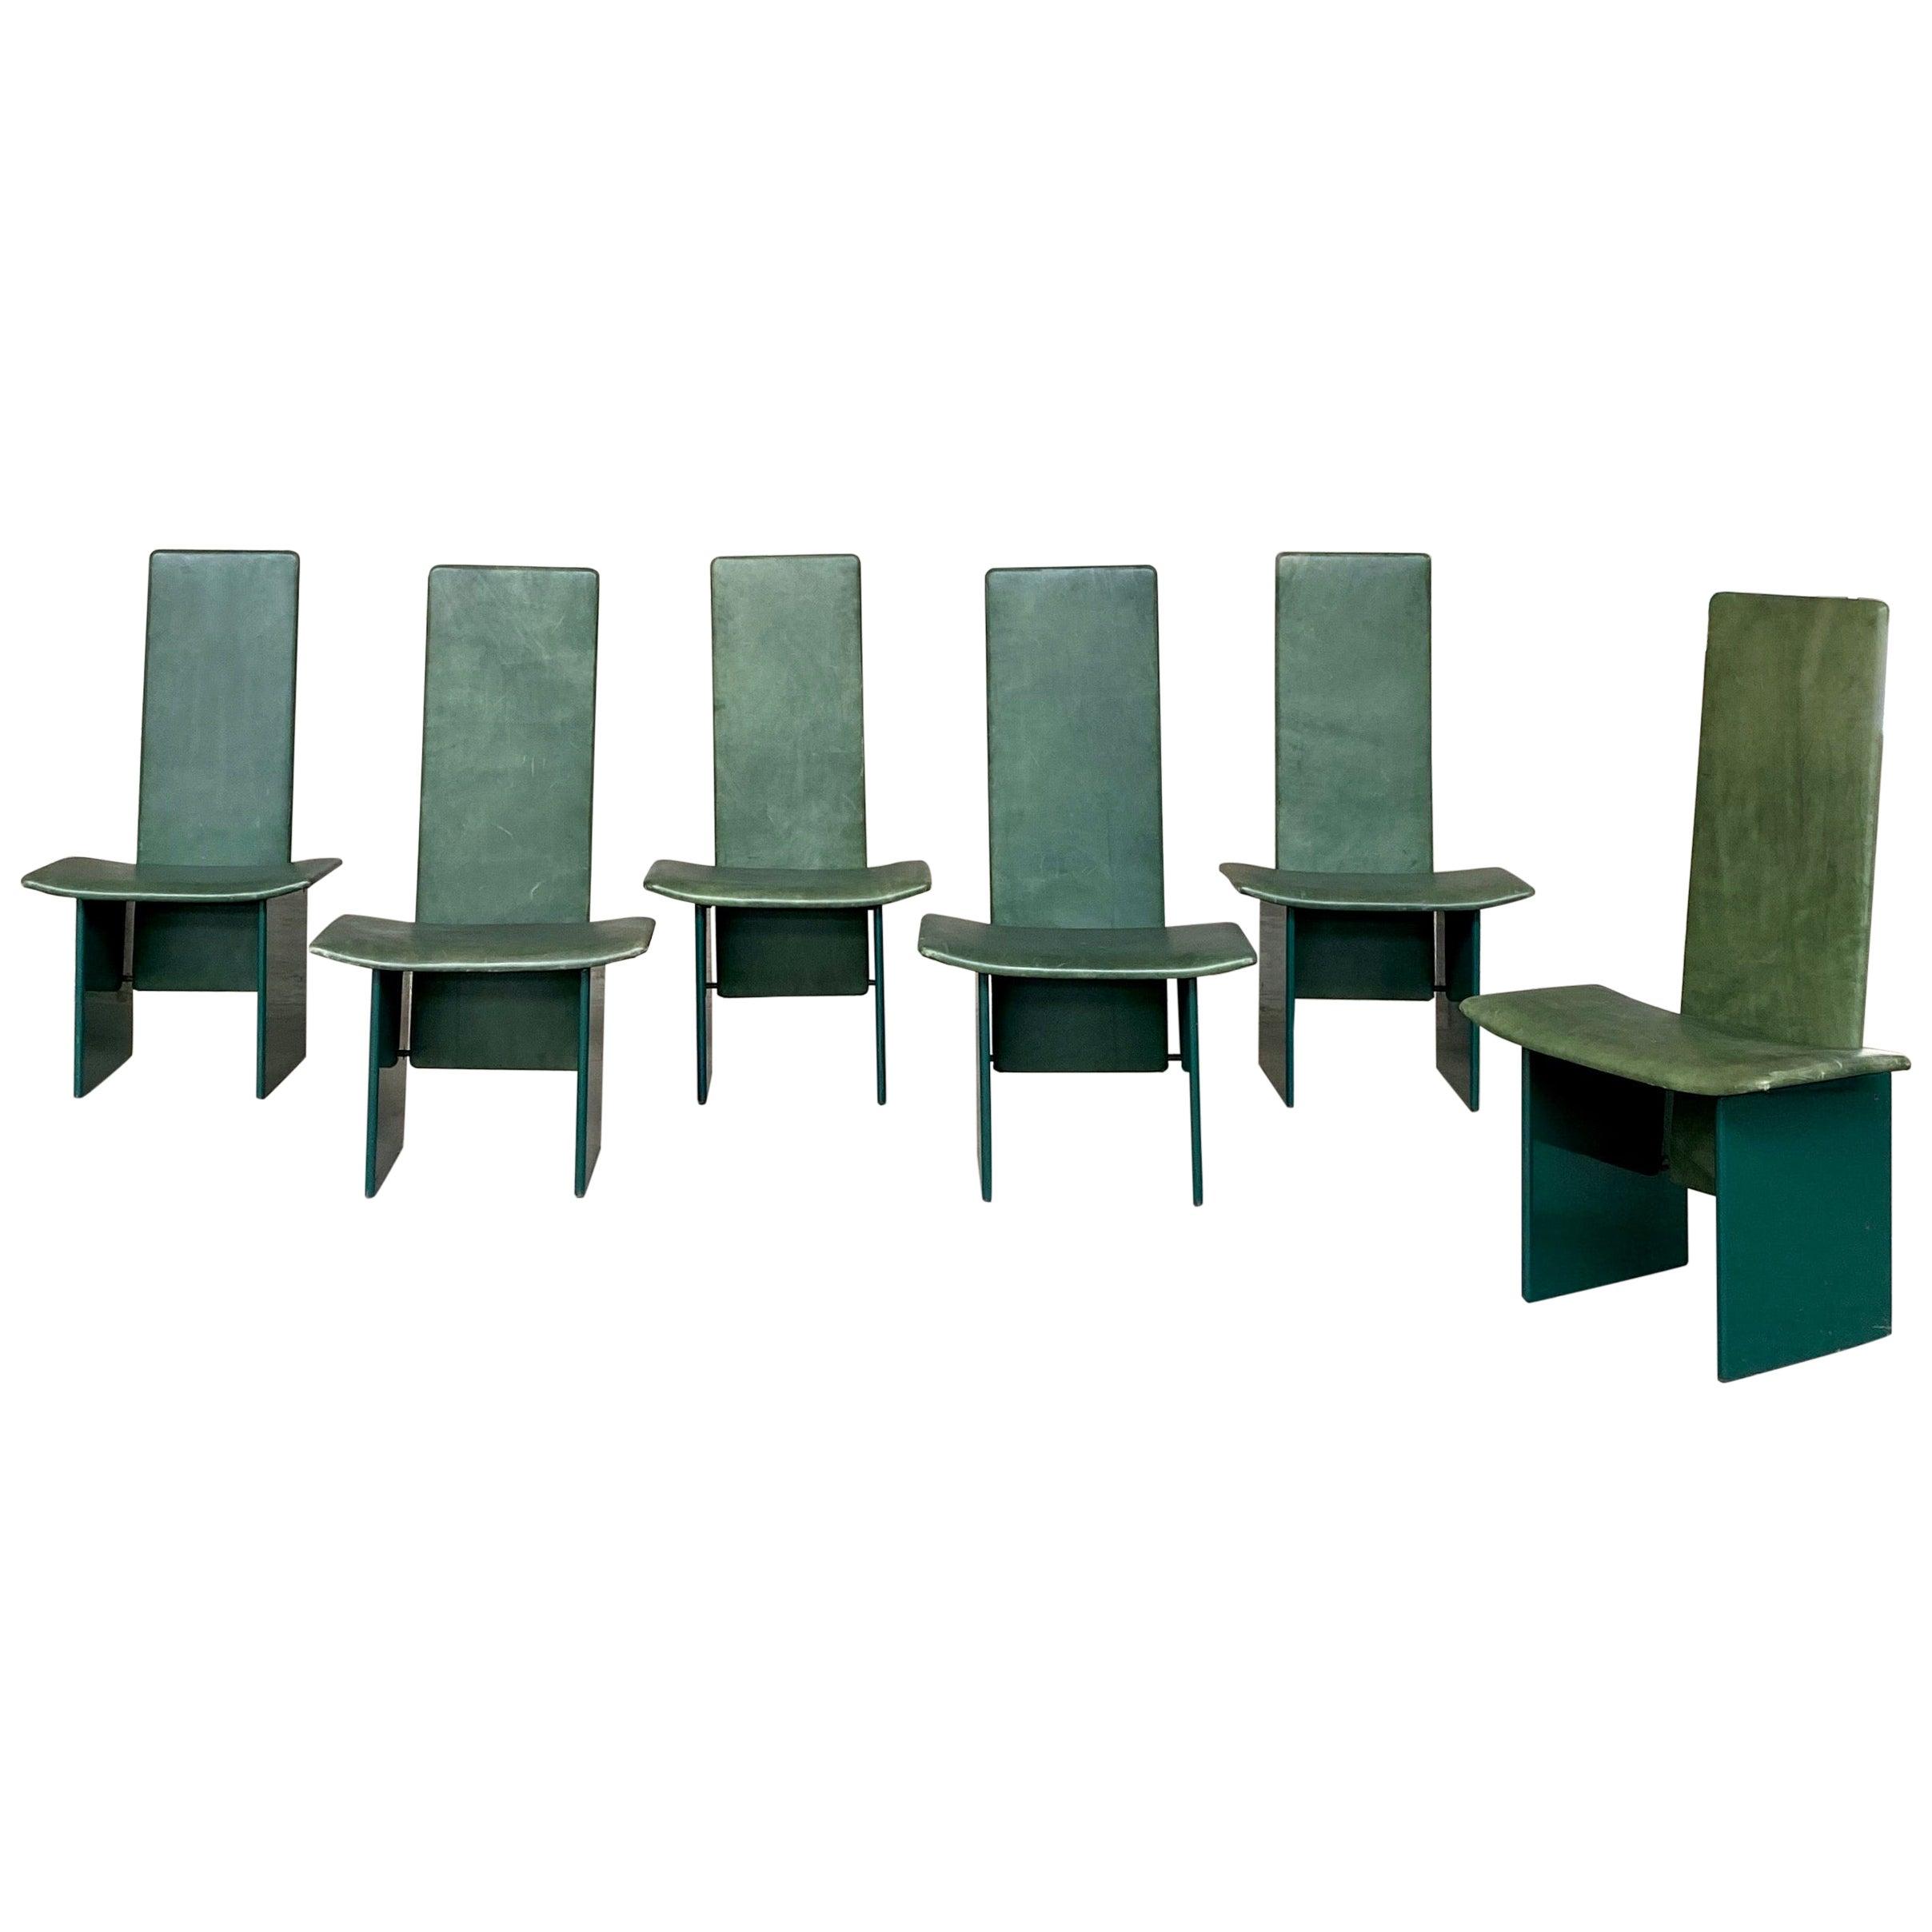 "Kazuhide Takahama ""Kazuki"" Chairs for Simon Gavina, 1968, Set of 6"